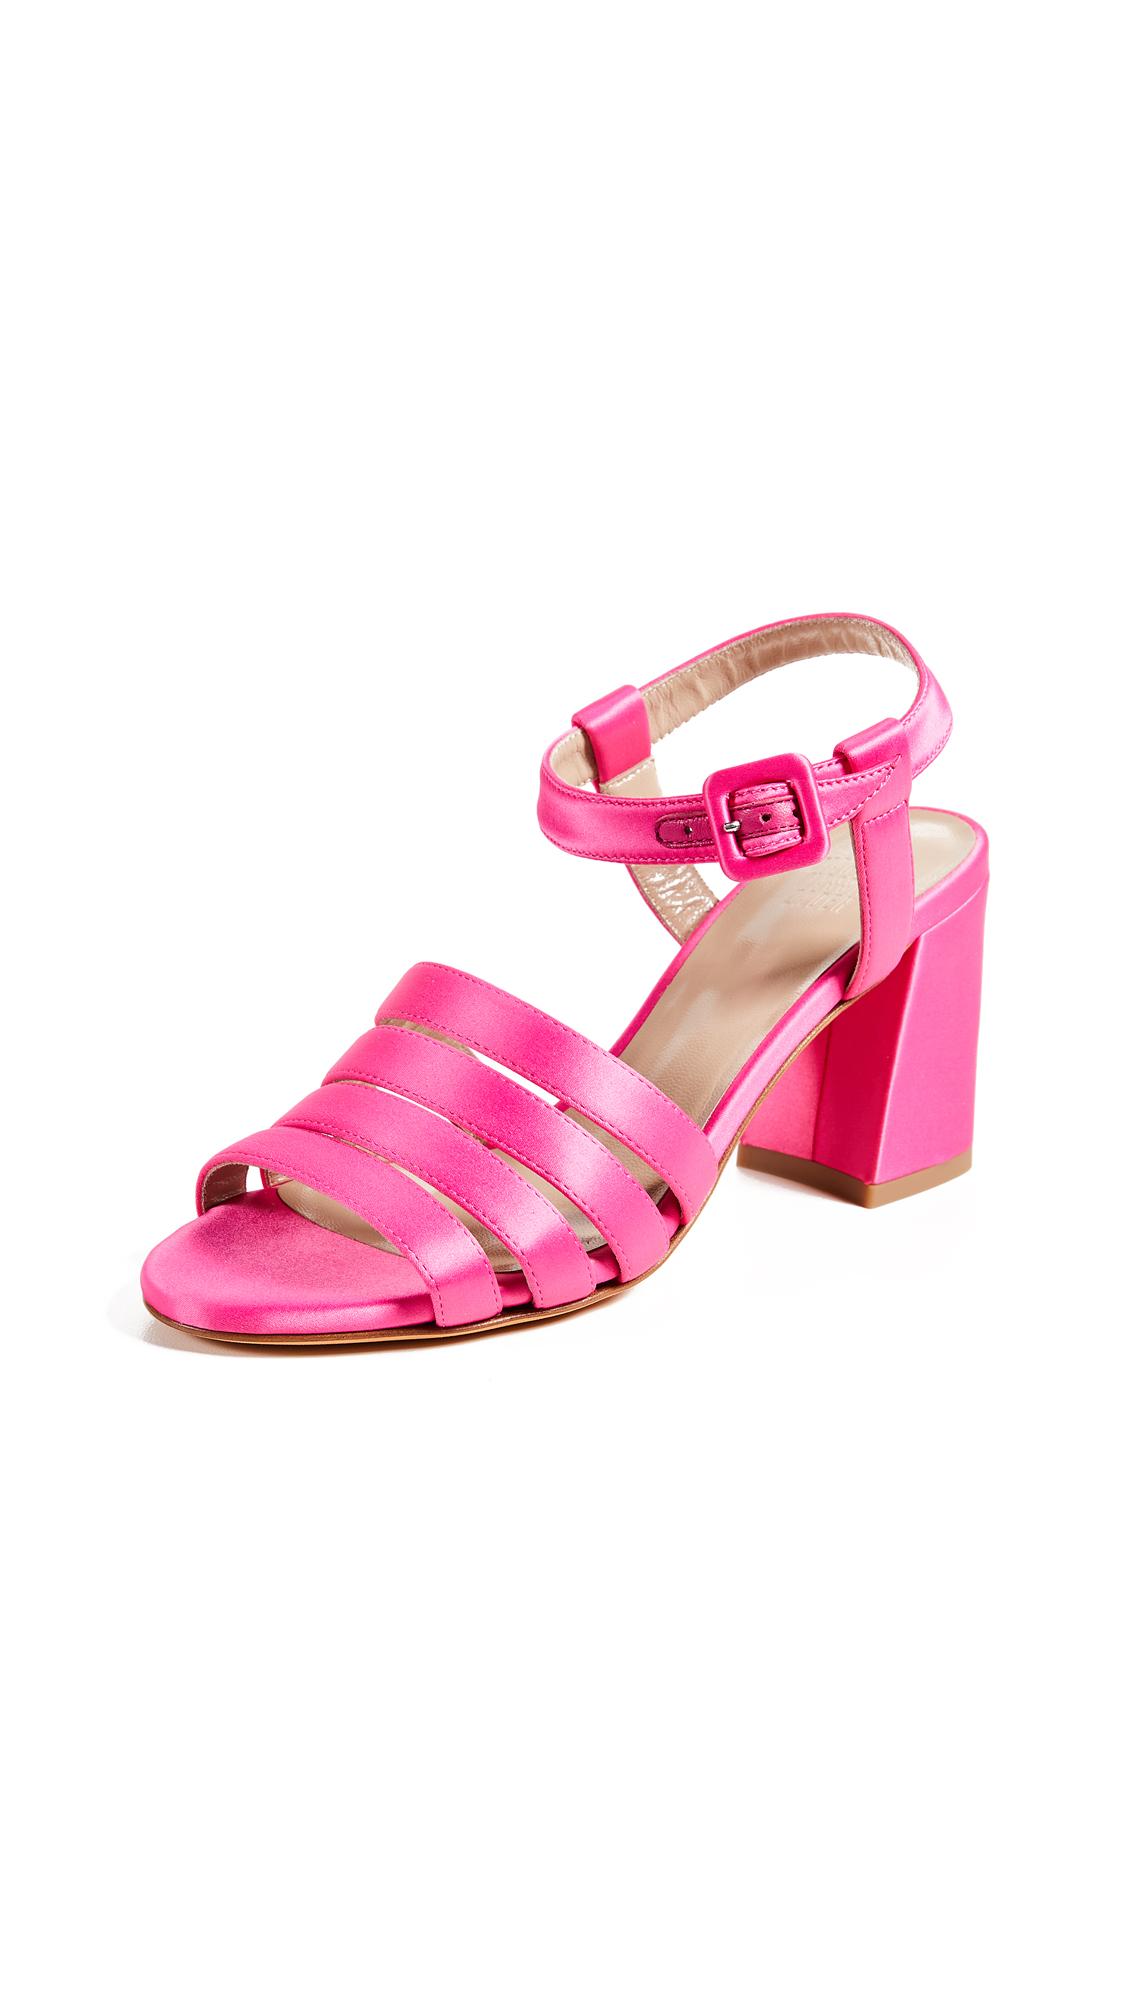 Maryam Nassir Zadeh Palma Sandals - Pink